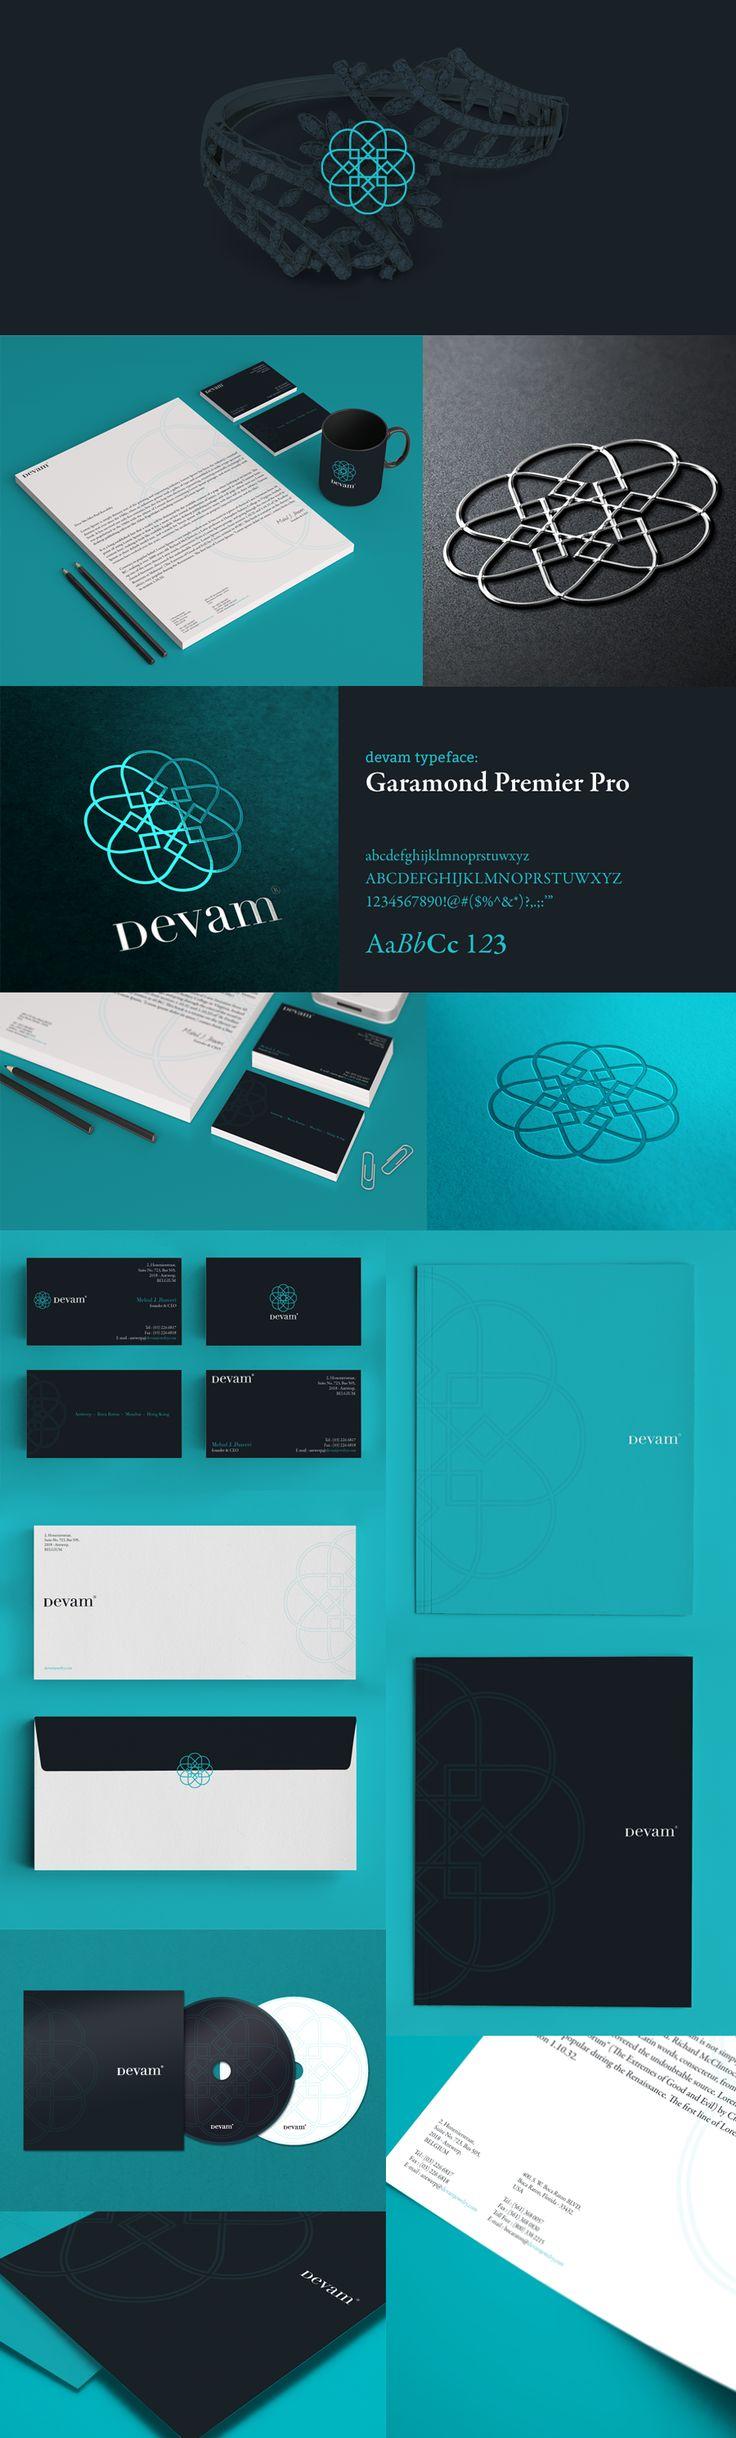 Devam branding | Designer: Triptic, repinned by www.BlickeDeeler.de